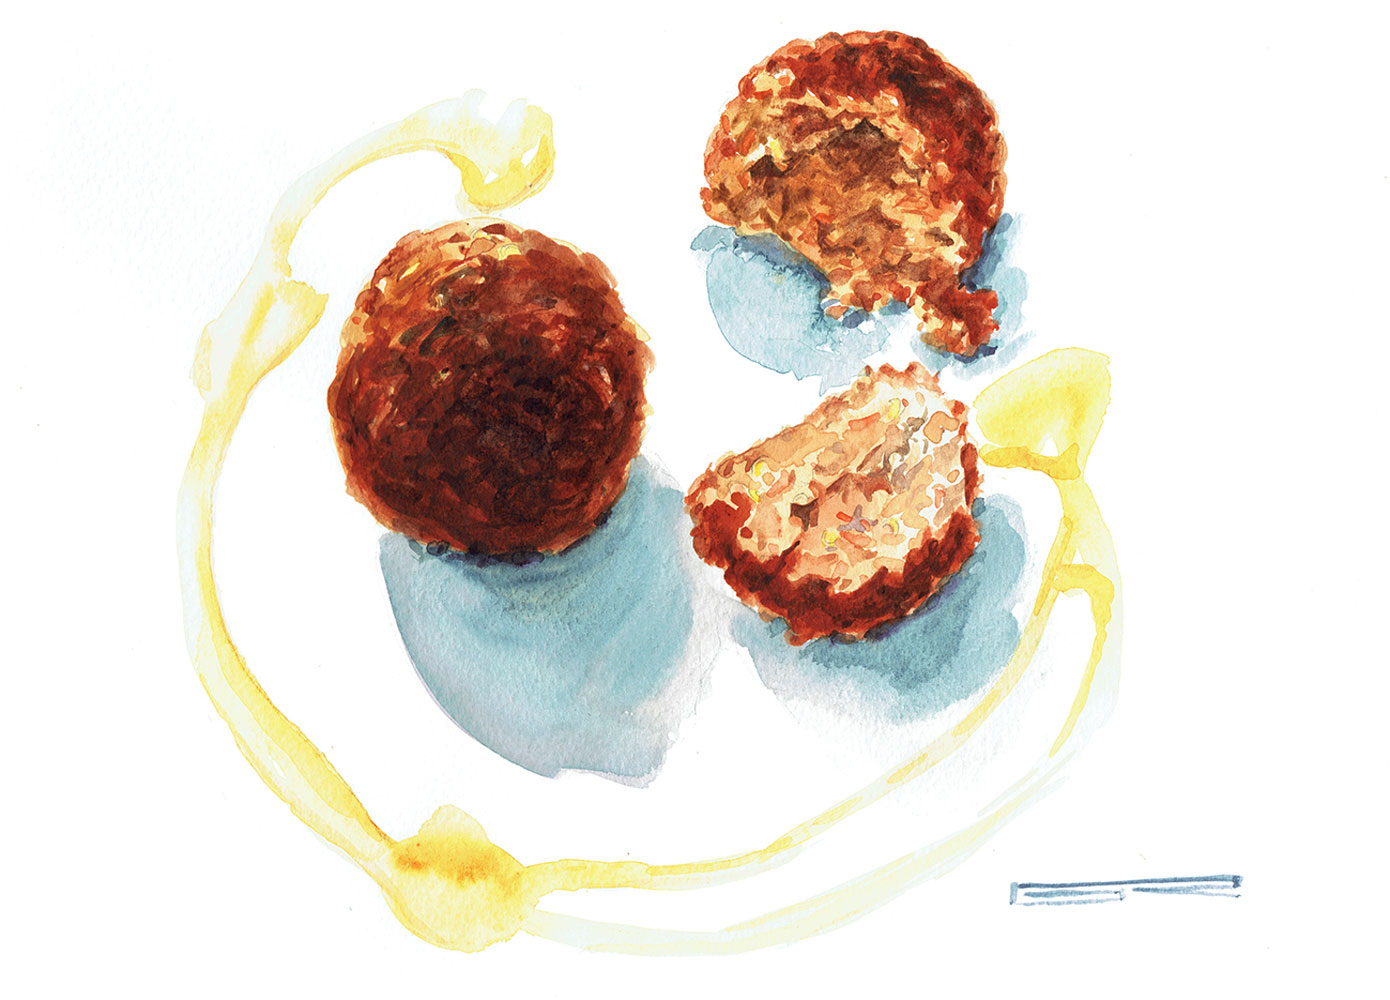 Albóndigas Ternera Pirenaica Con Salfaina (durante Todo El Showcooking Hubo Opción Vegana, En Este Caso, Con Quinoa)